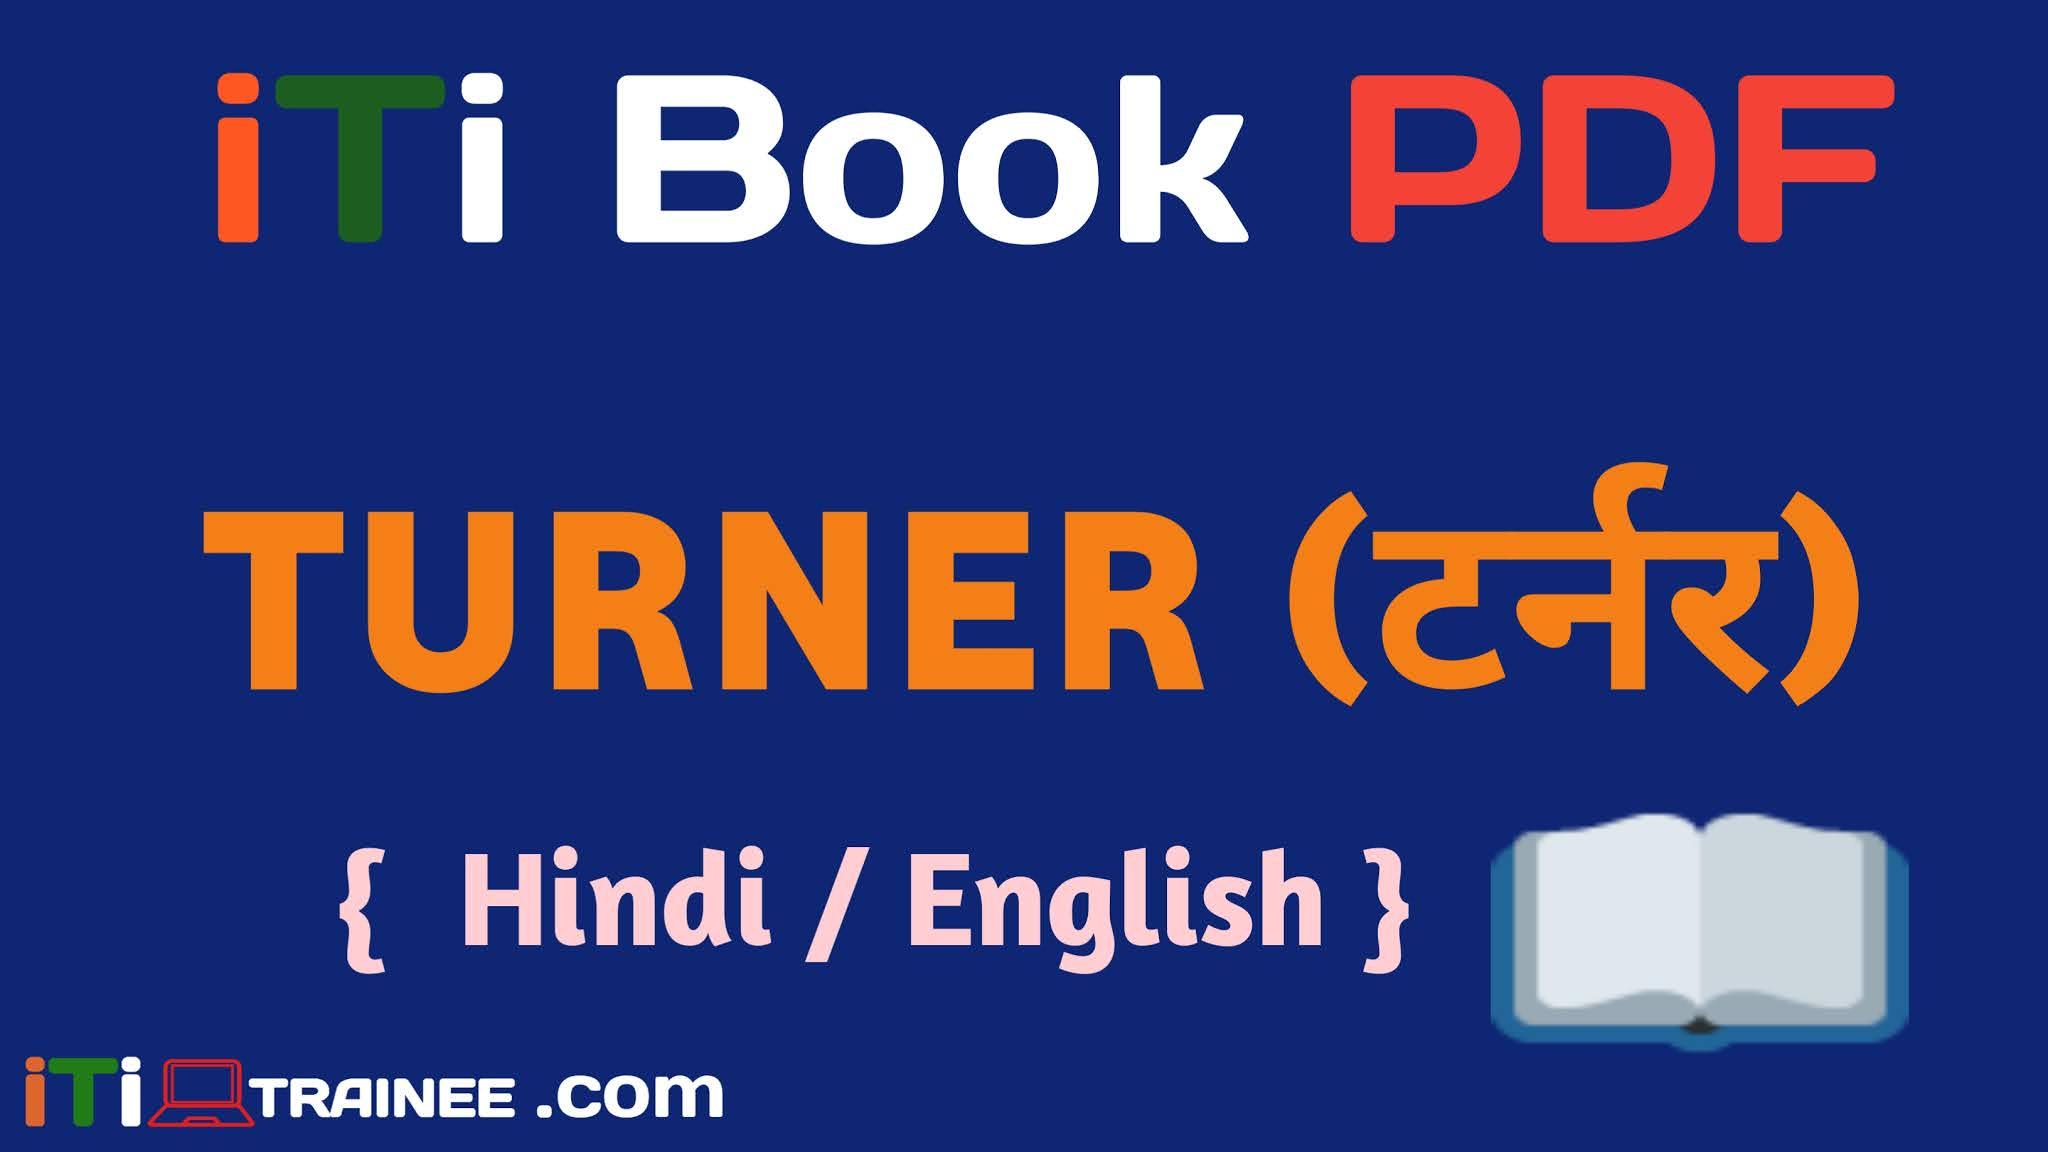 ITI TURNER BOOK PDF Download